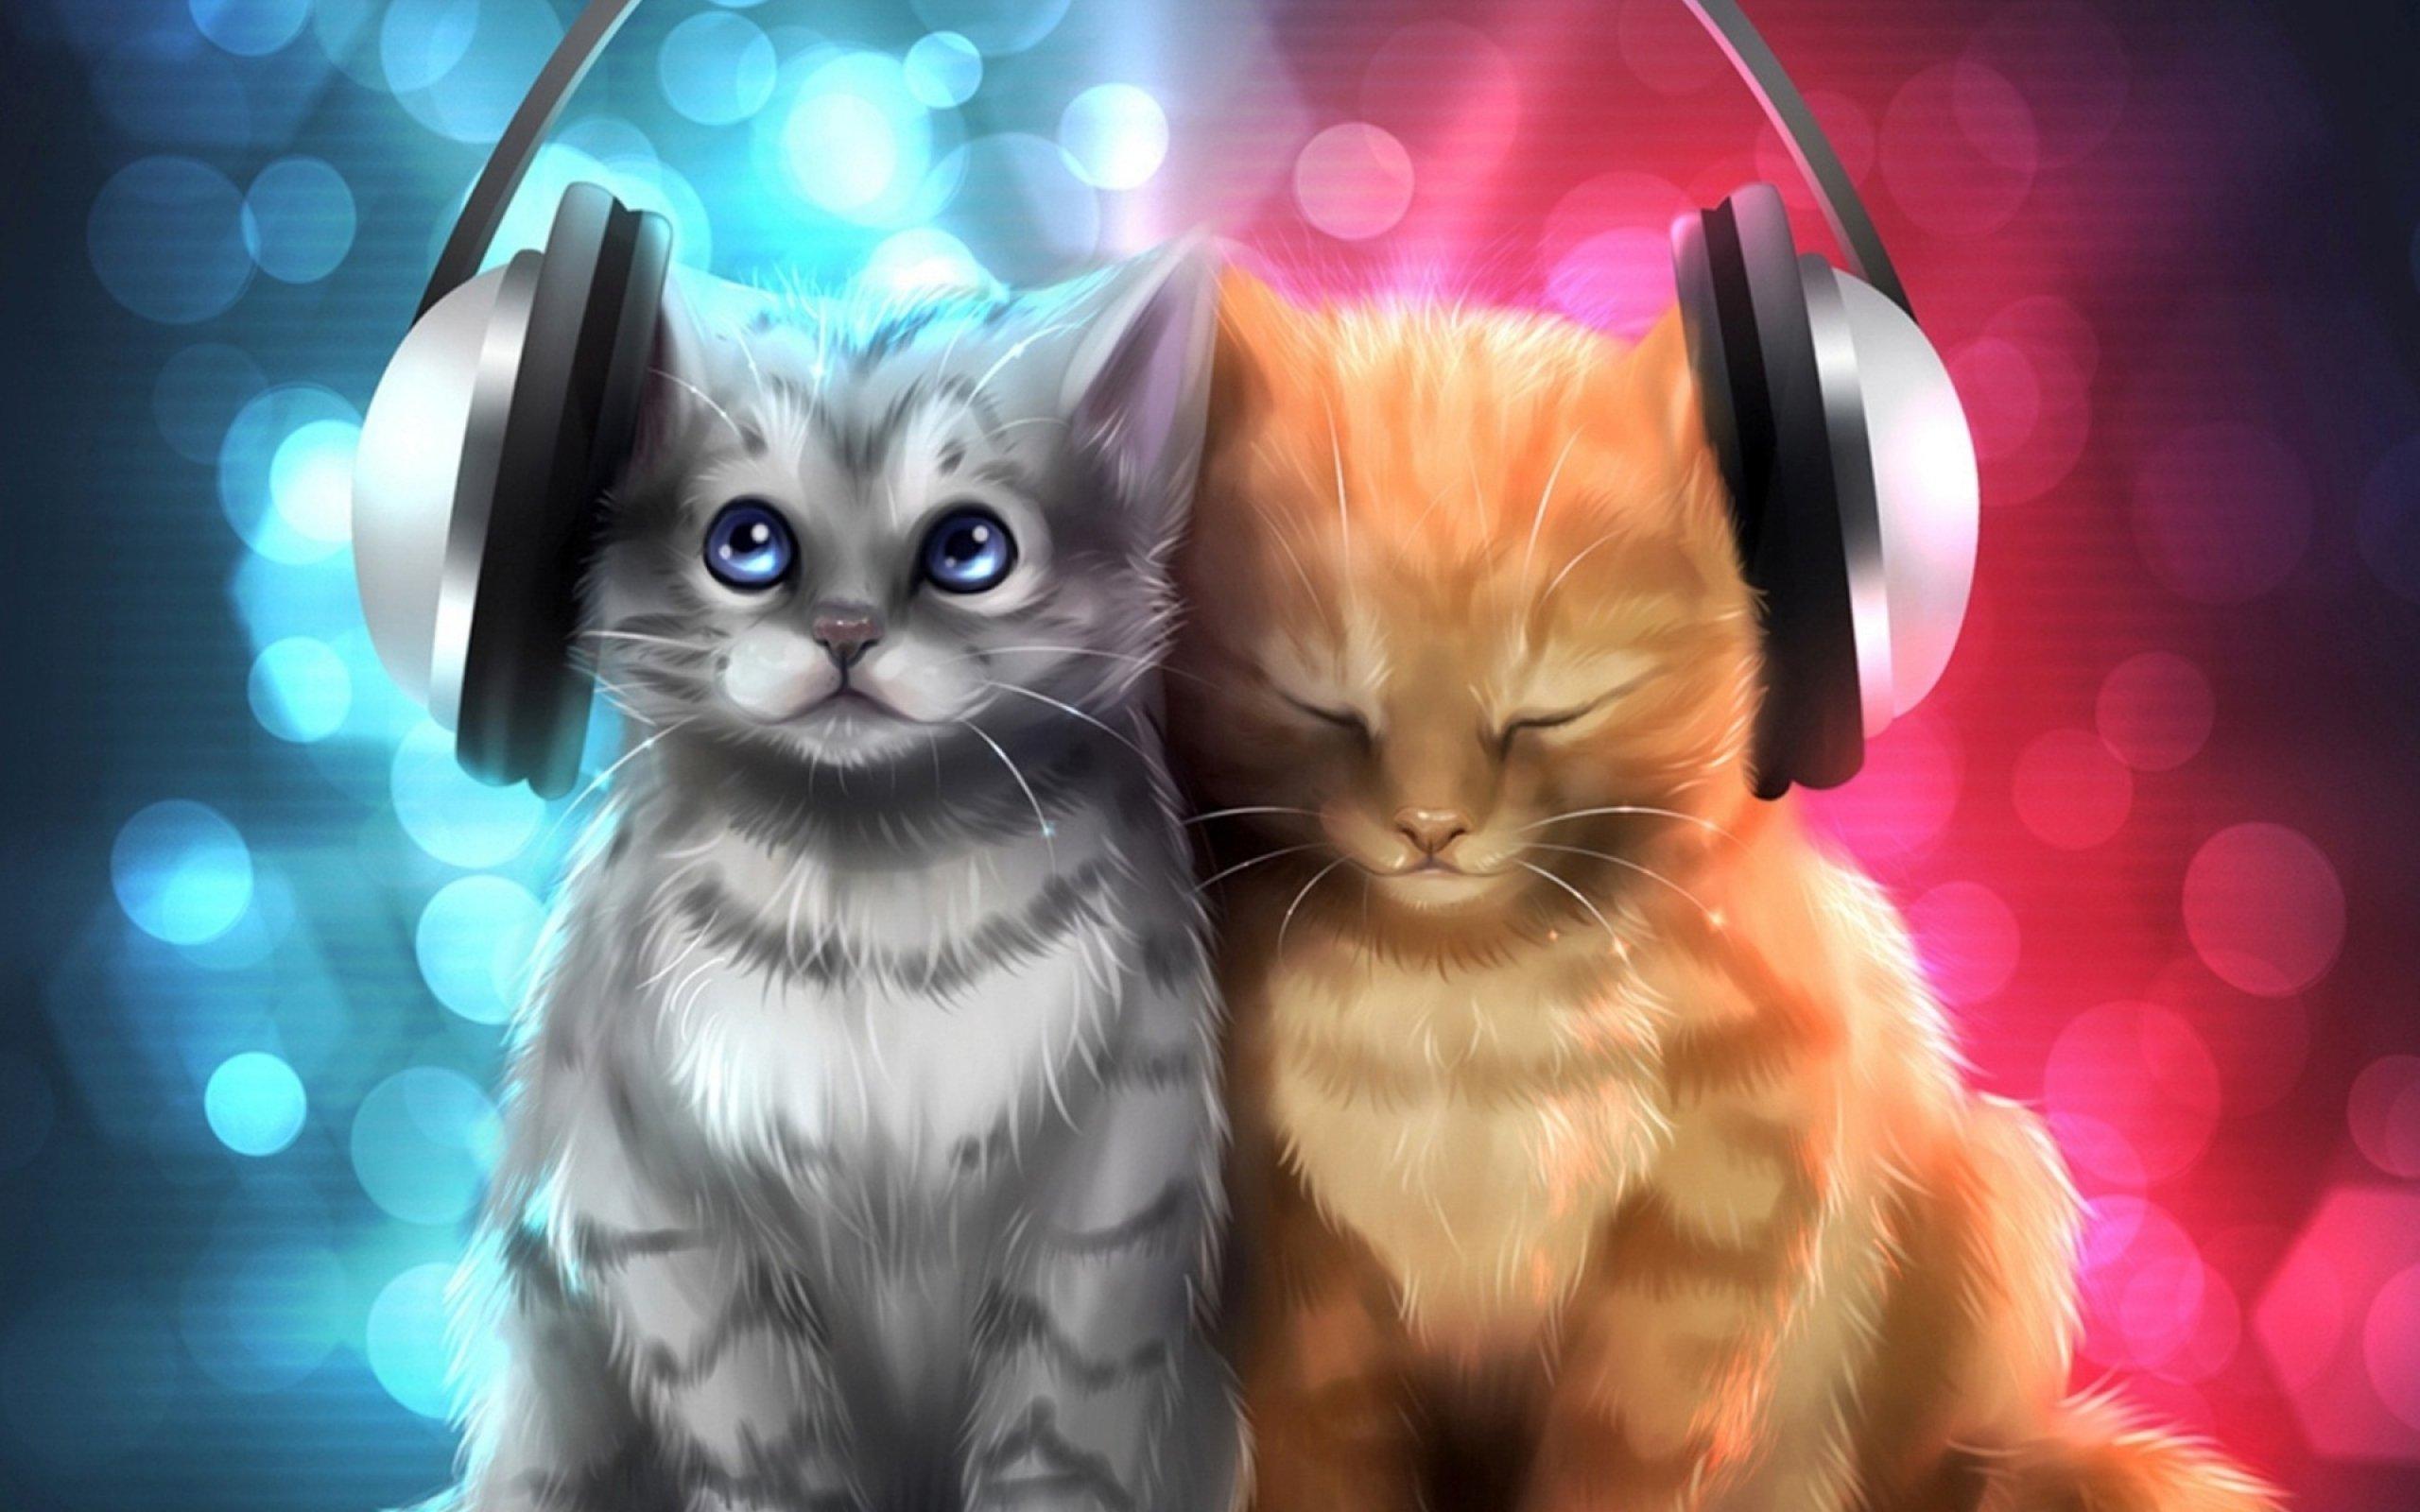 Hd Animal Wallpapers Hd Music Wallpapers: Animal Cat Cats Artwork Art Kitten Headphones Wallpaper